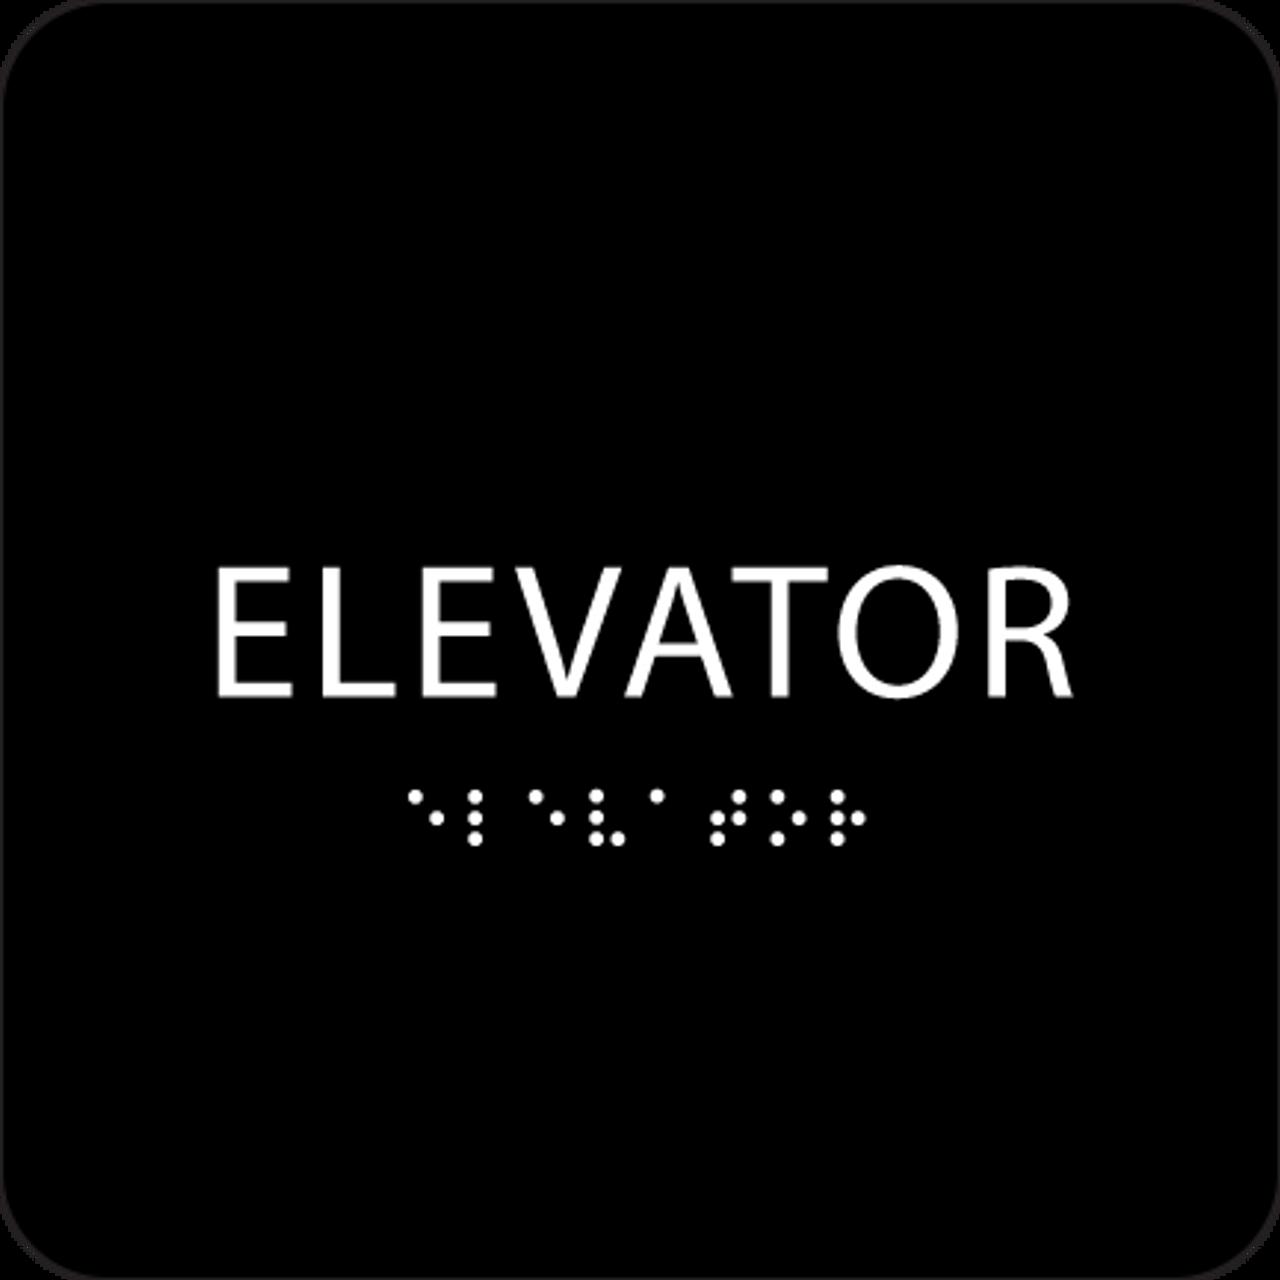 Black ADA Elevator Sign